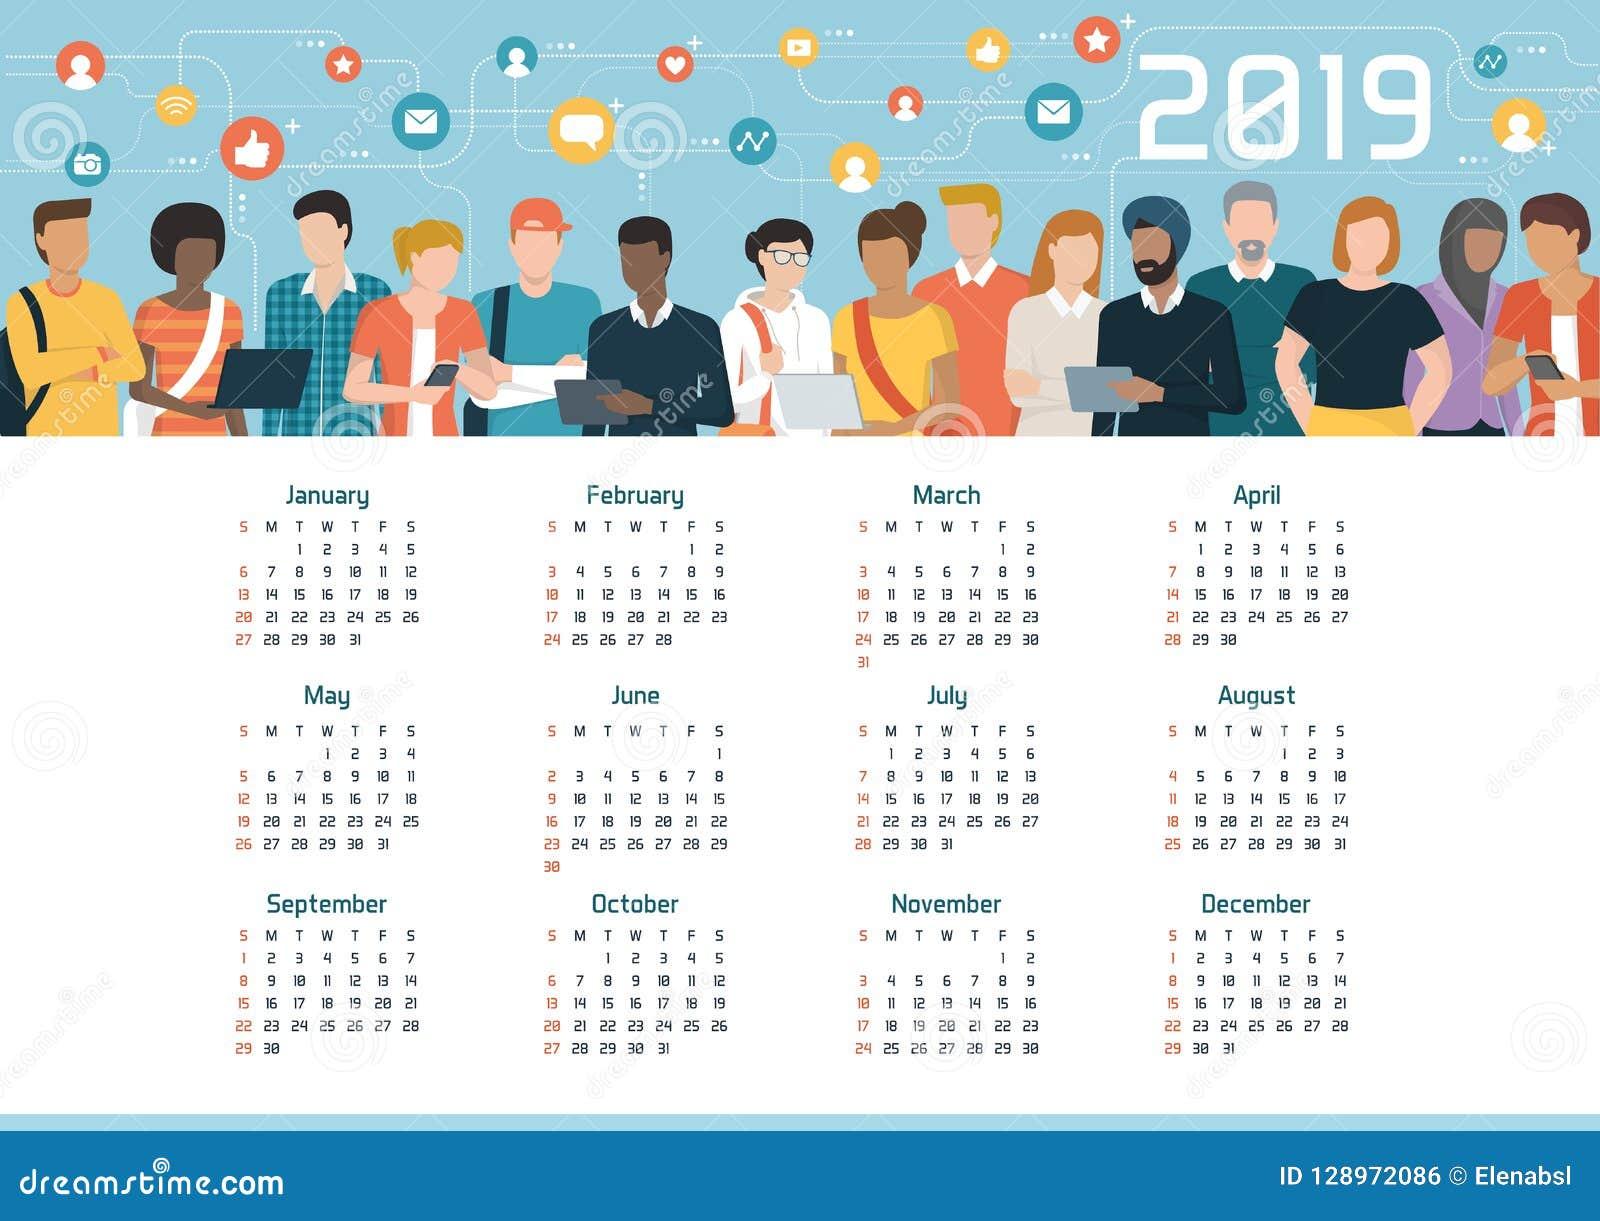 Global community connected through social media, calendar 2019